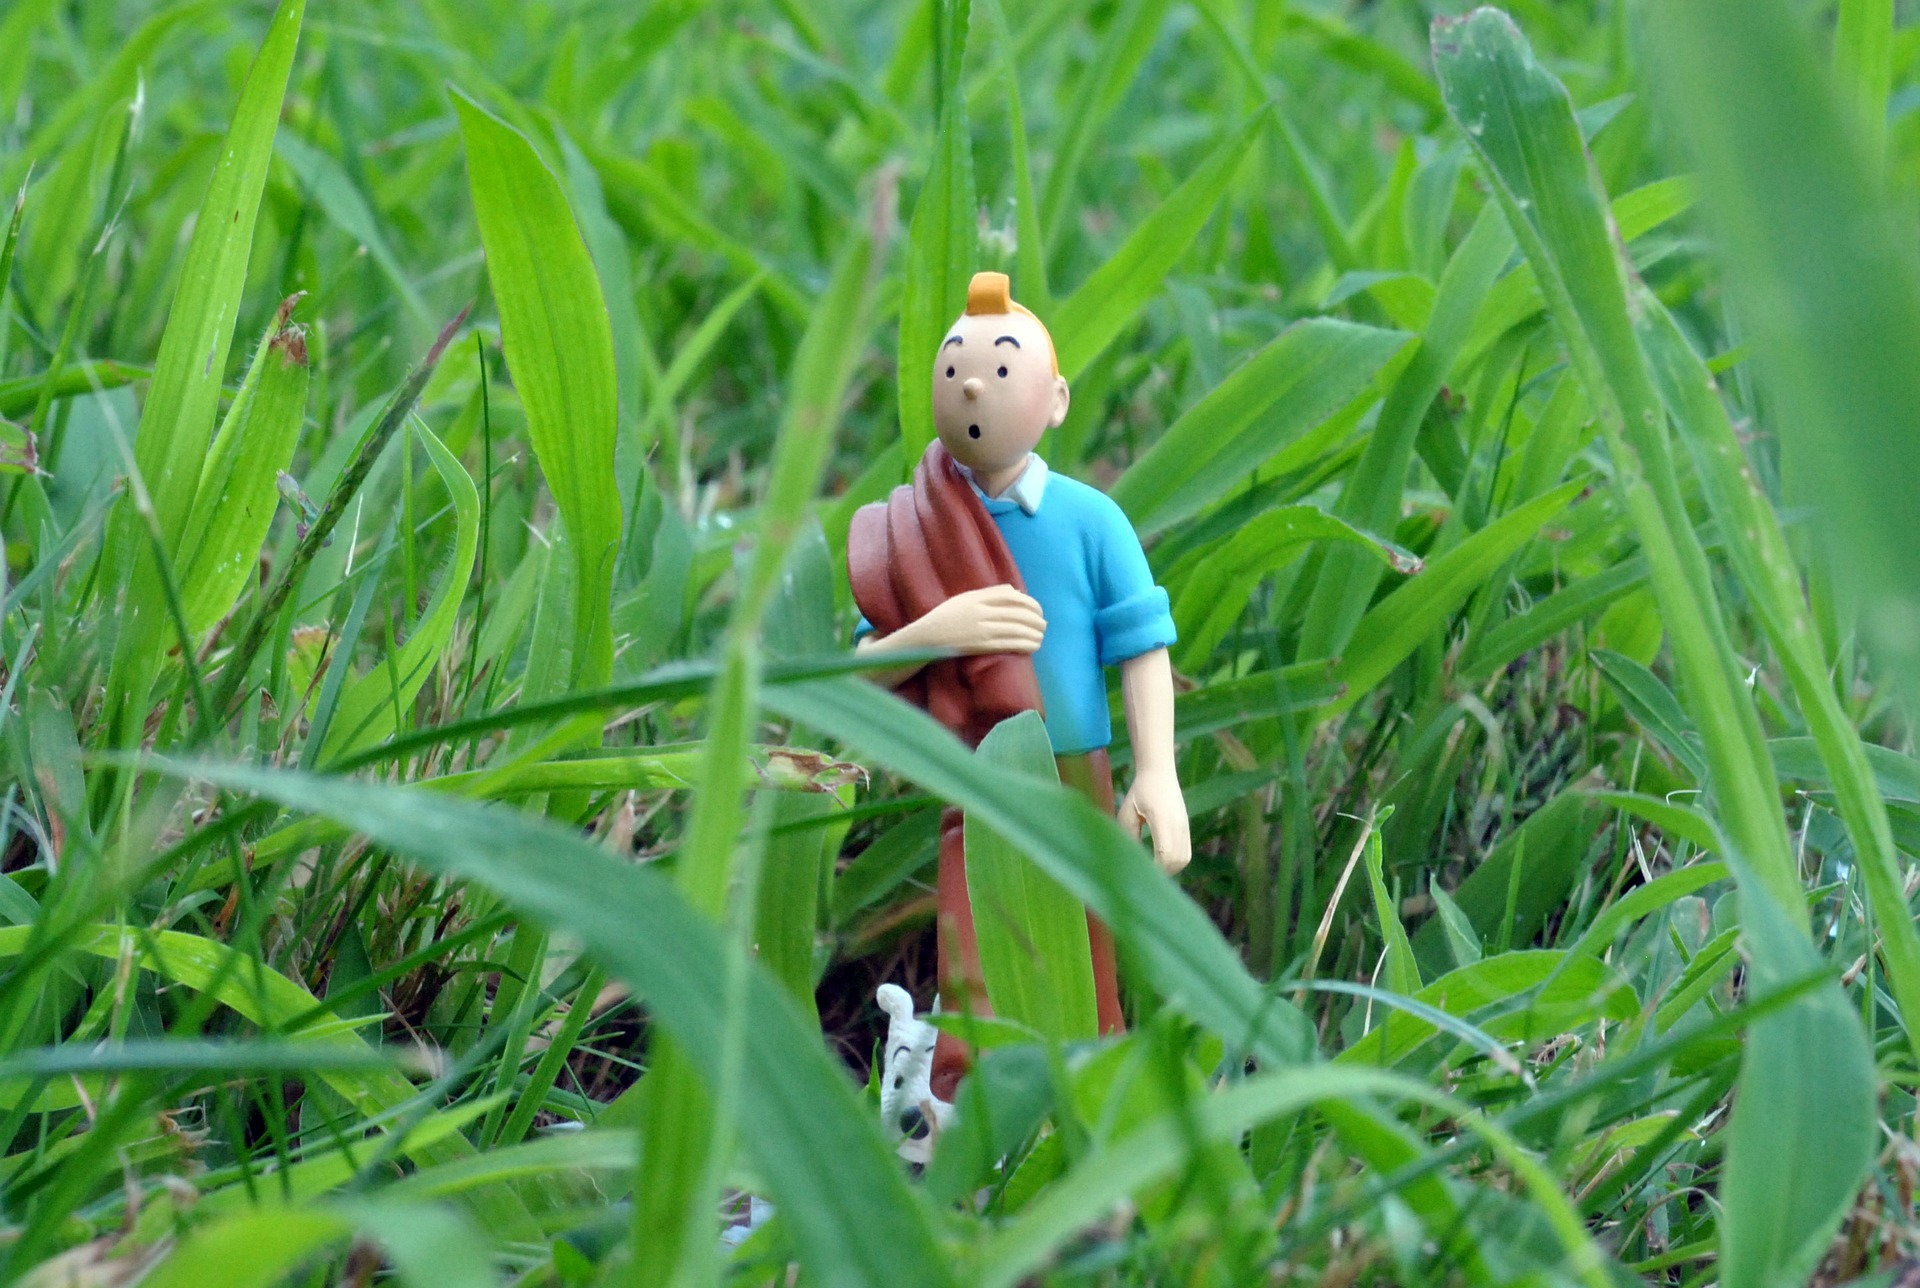 « Tintin au bouclage », l'album inédit, sortira en mars